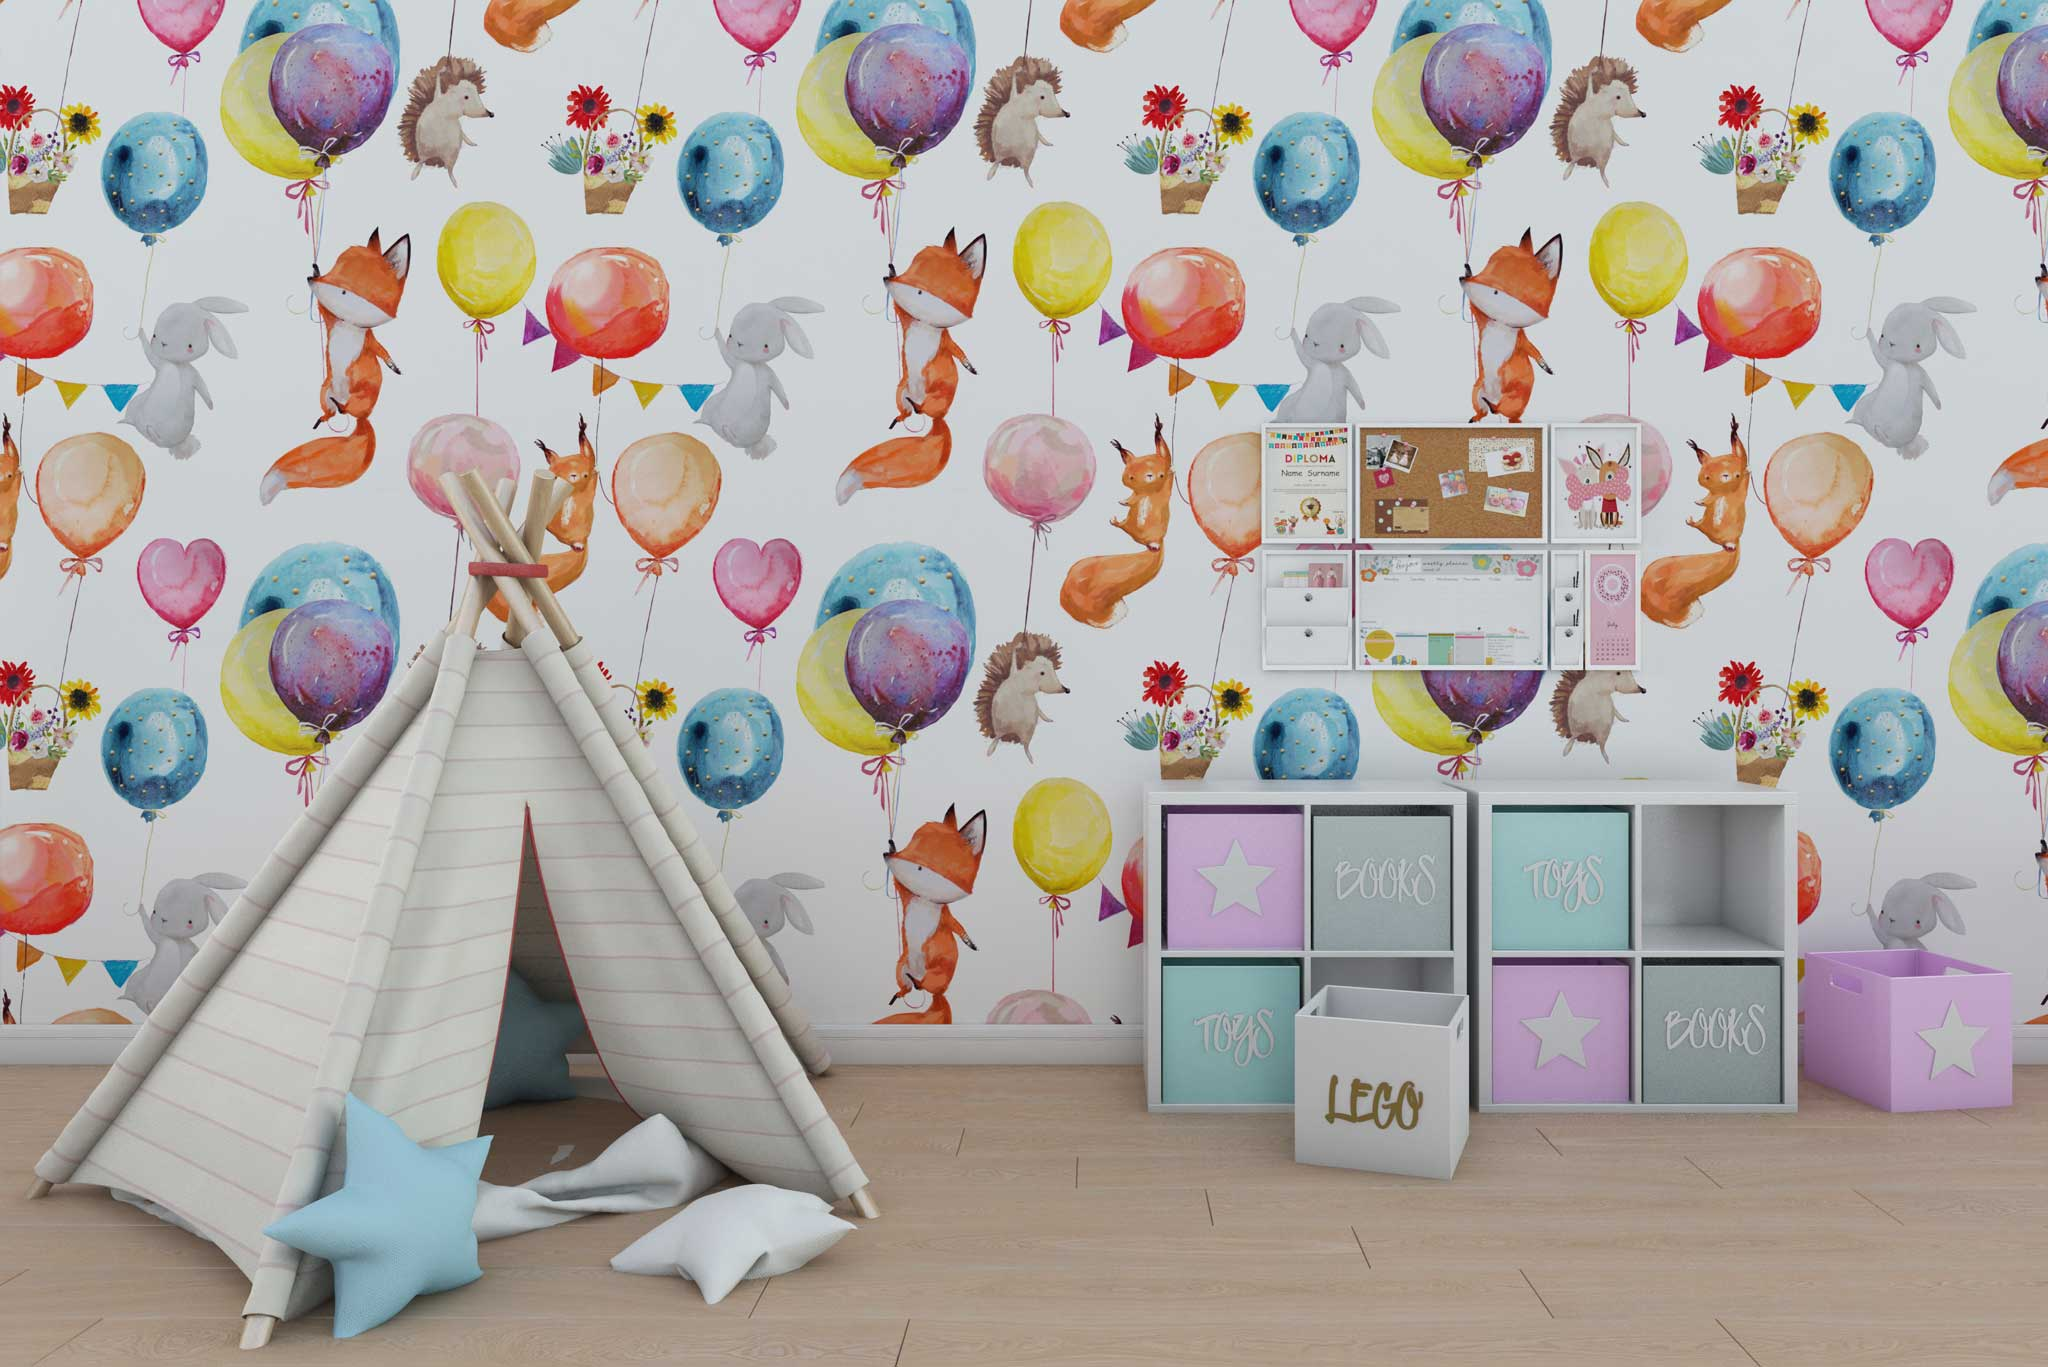 tapet-fototapet-design-personalizat-customizabil-comanda-special-camera-dormitor-copii-model-desen-vulpite-iepurasi-baloane-multicolor-fundal-alb